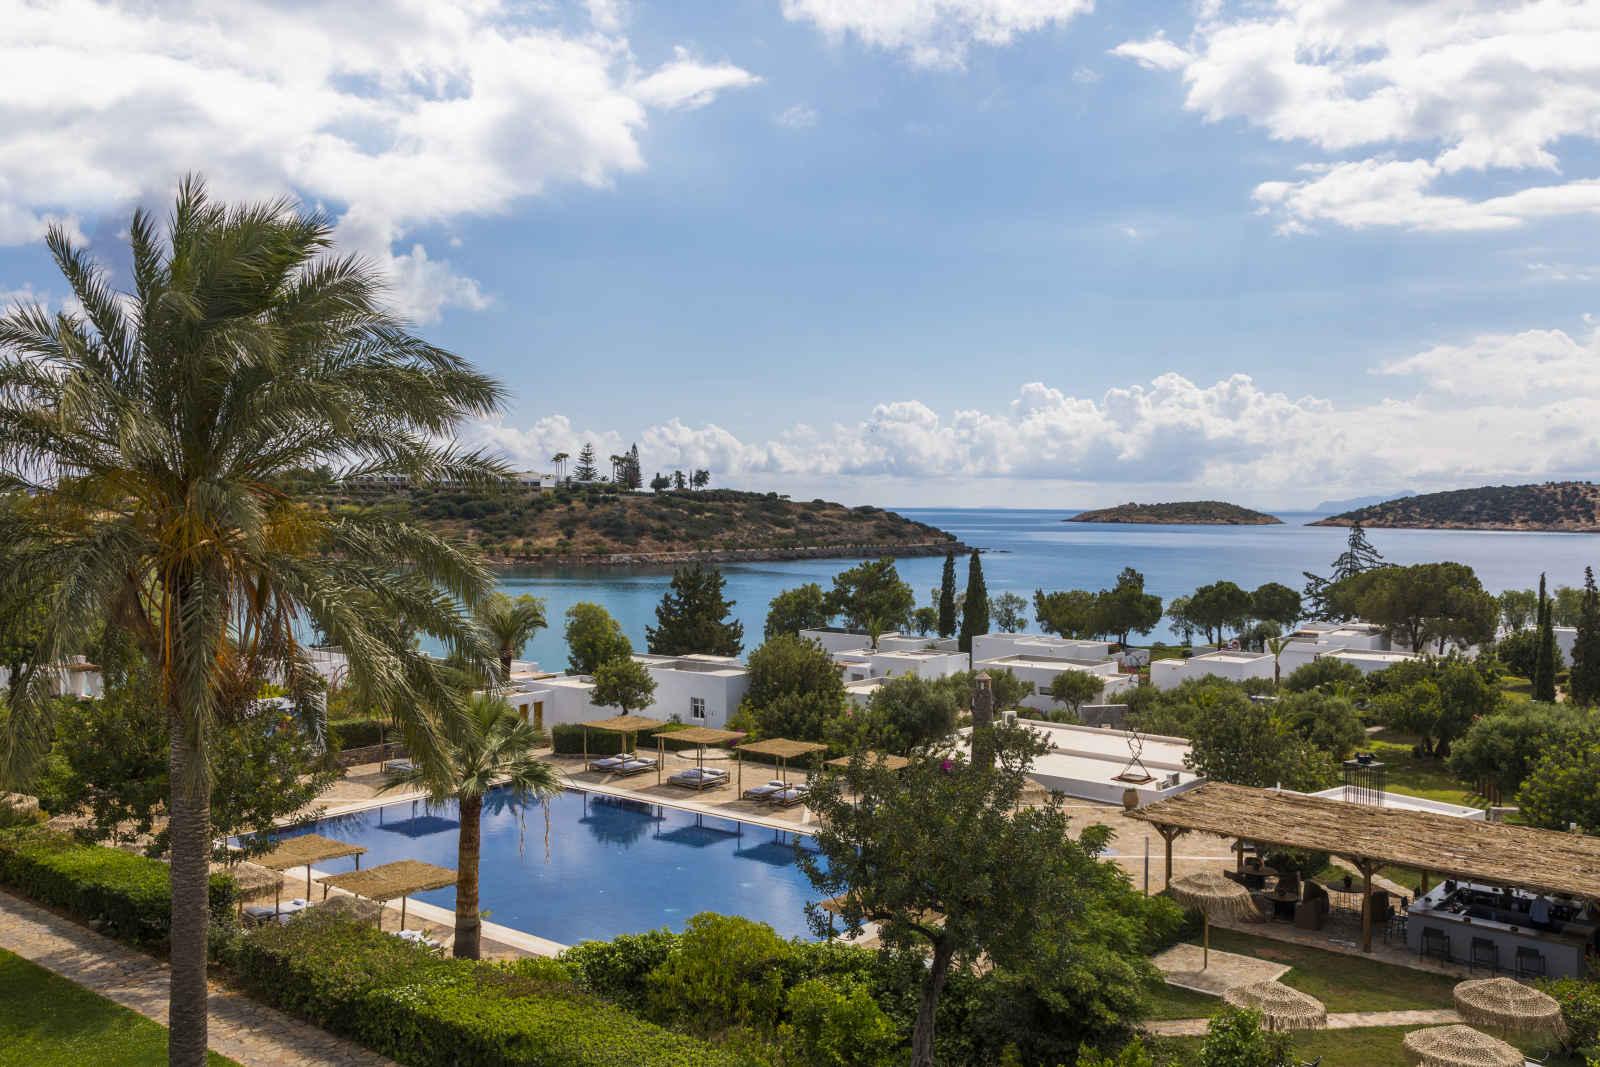 voyage de luxe, sejour de prestige Minos Beach Art Hotel - 5* - voyage  - sejour